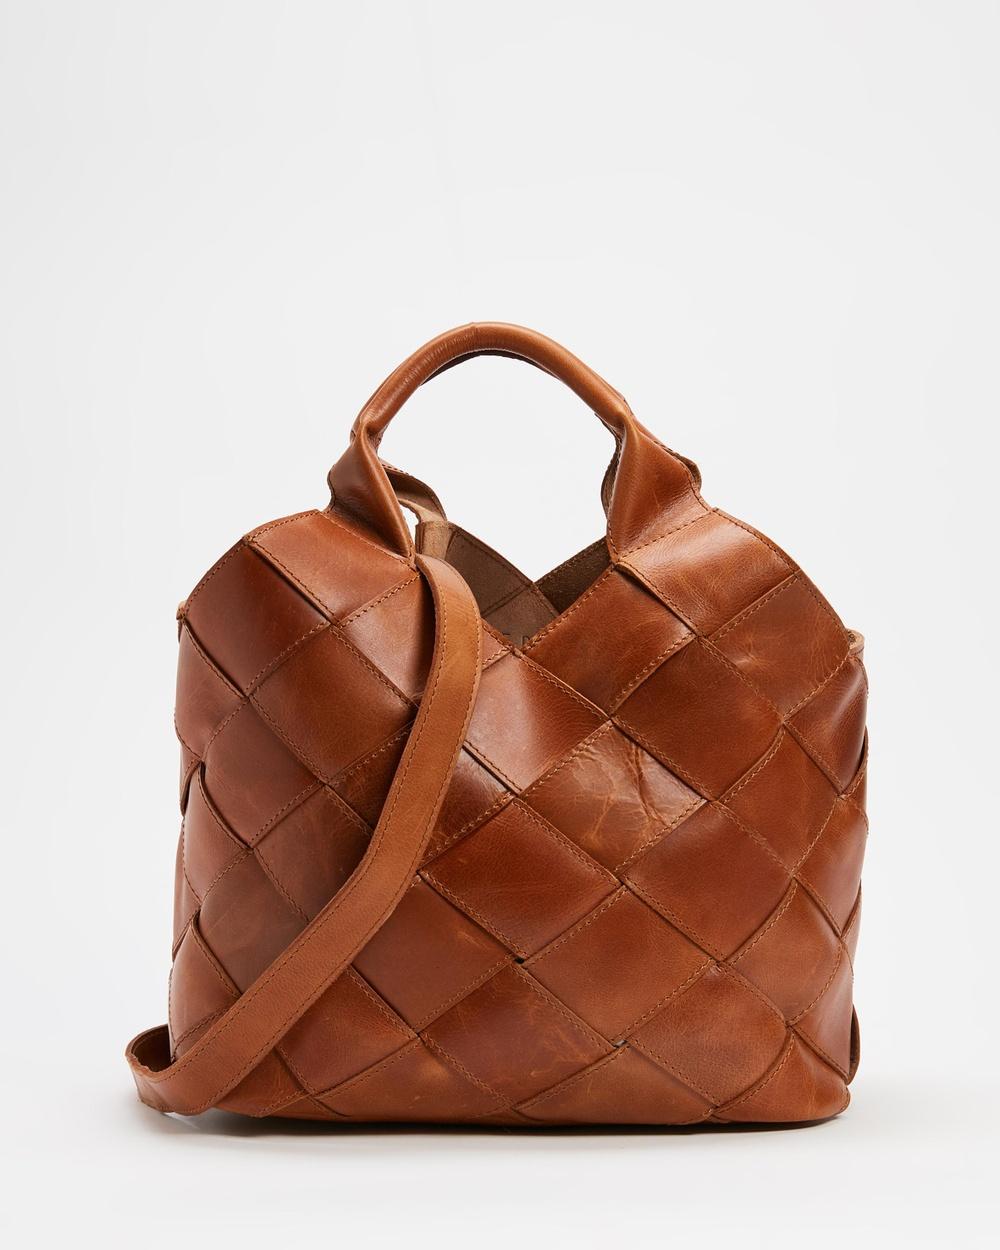 AERE Woven Leather Tote Bag Handbags Tan Leather